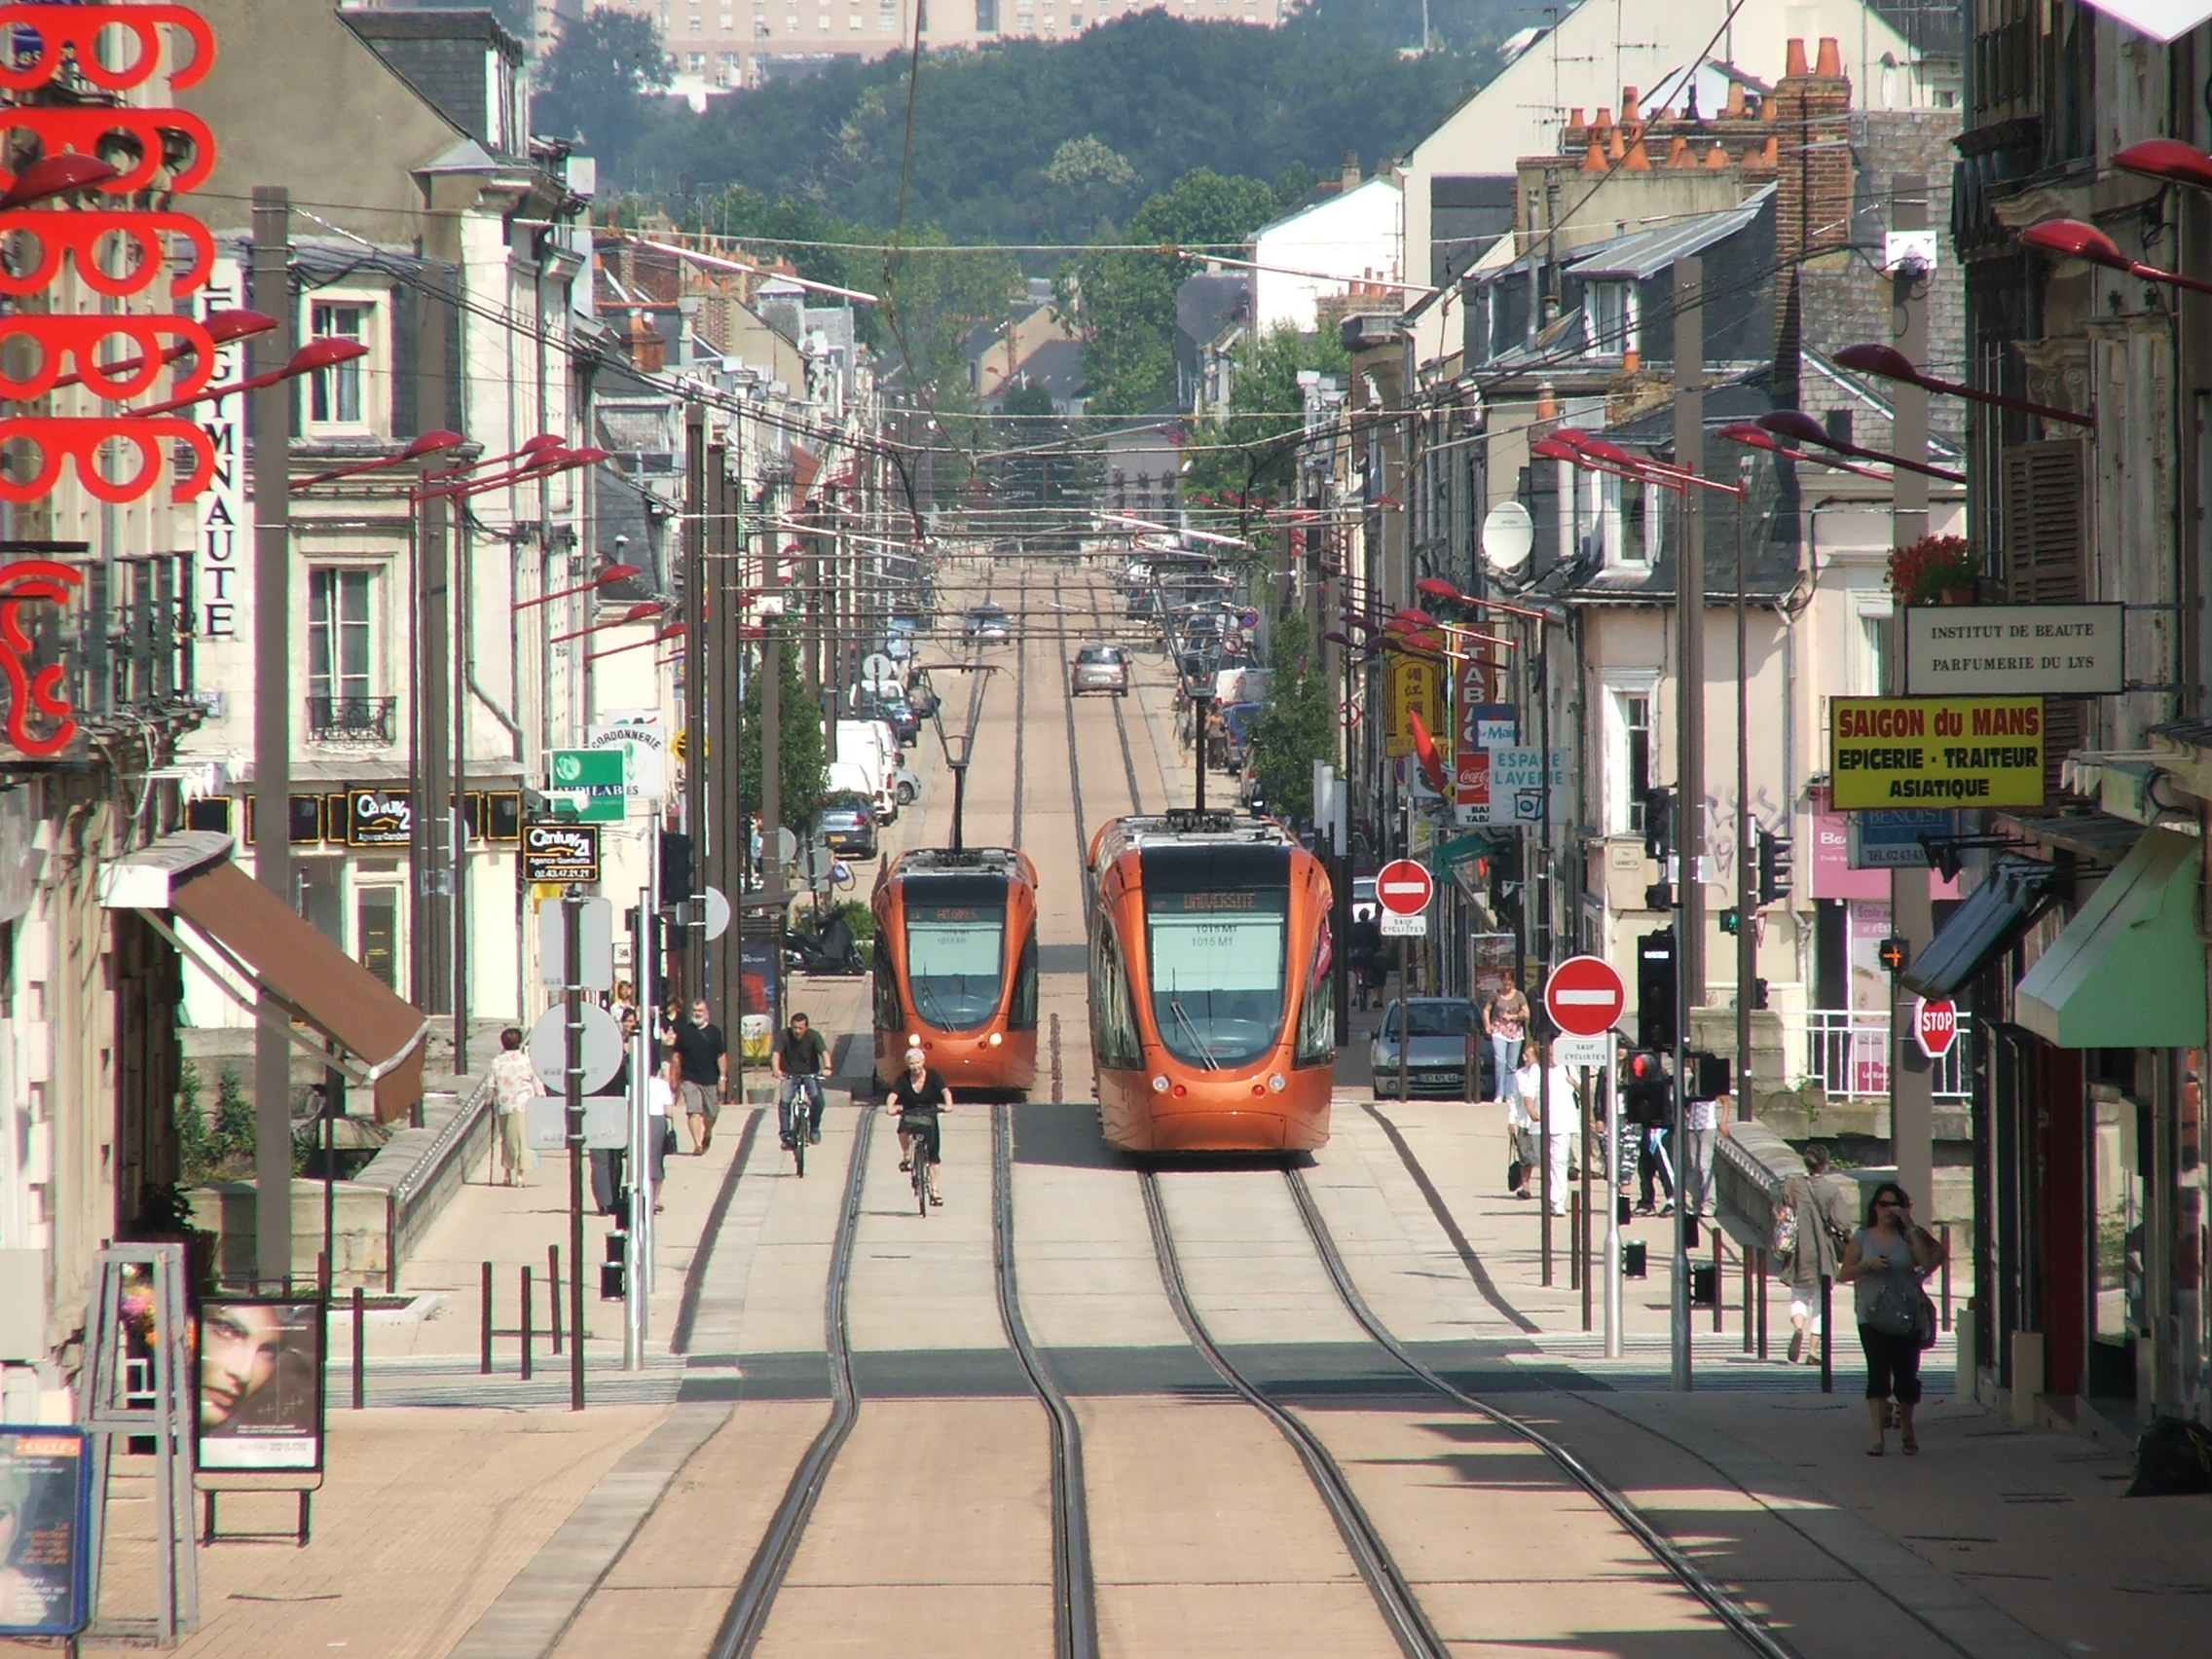 Le-Mans-Rue-Gambetta